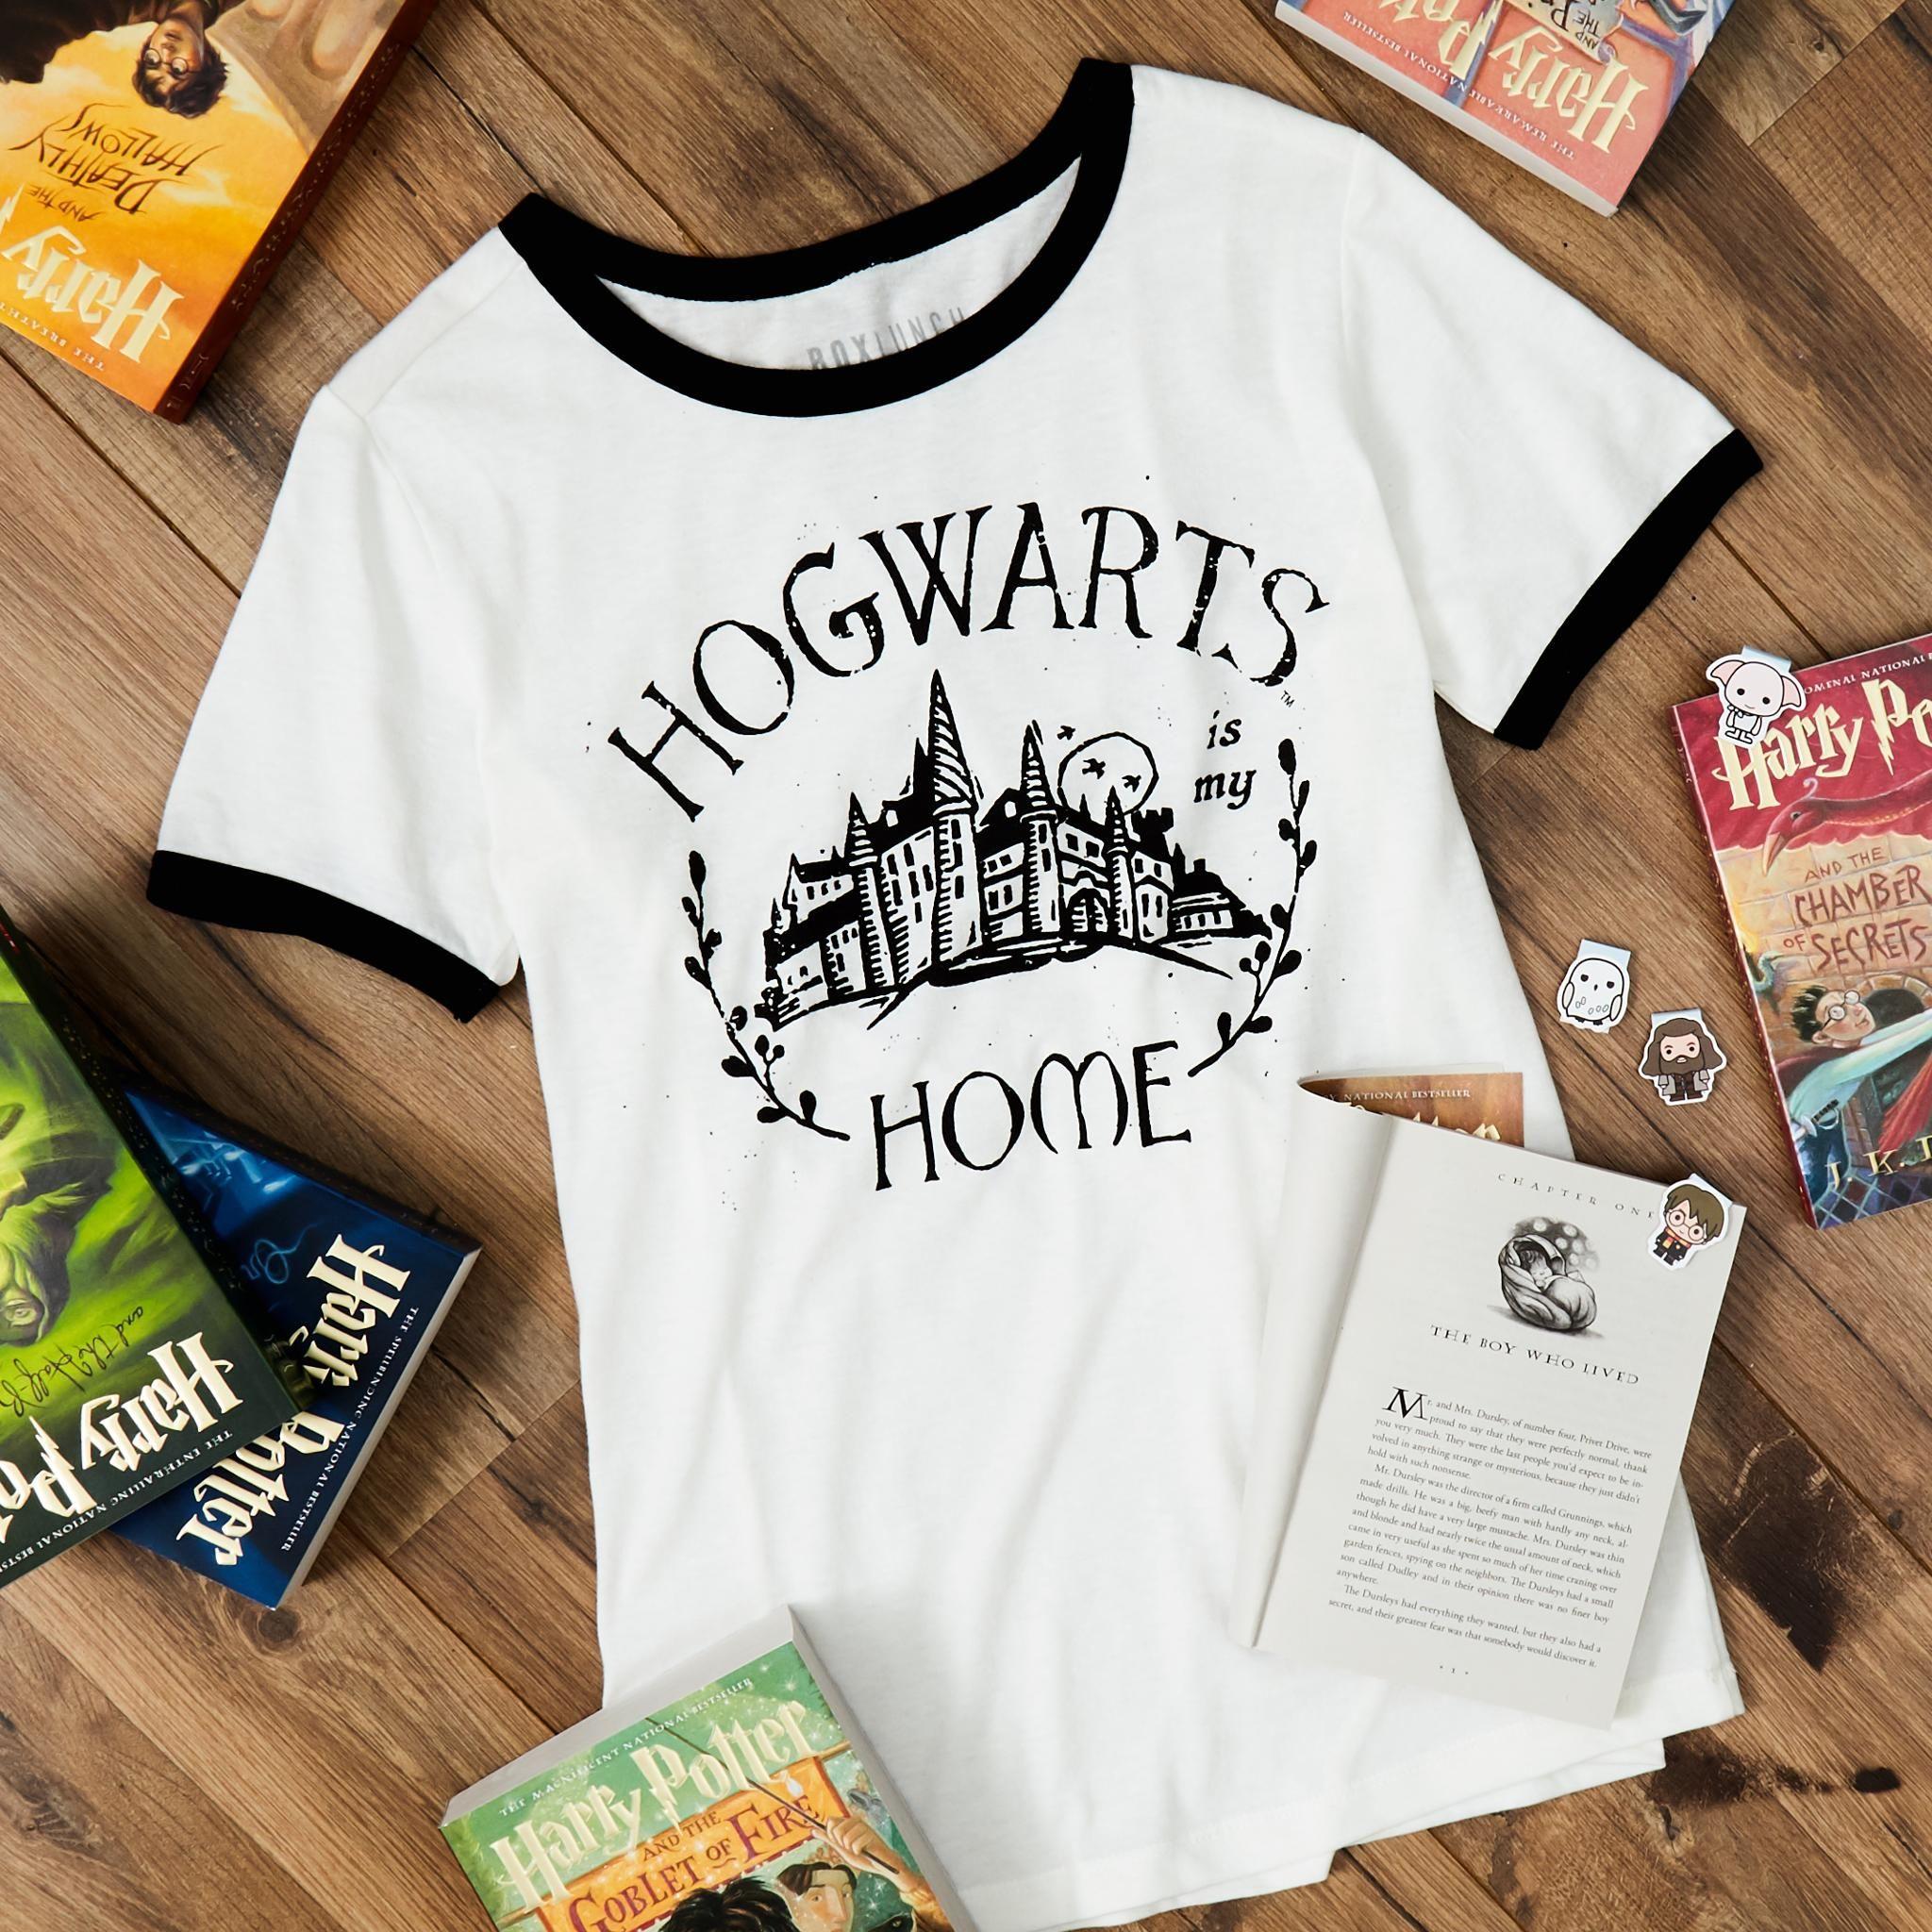 Femme T-Shirt Hogwarts HARRY POTTER